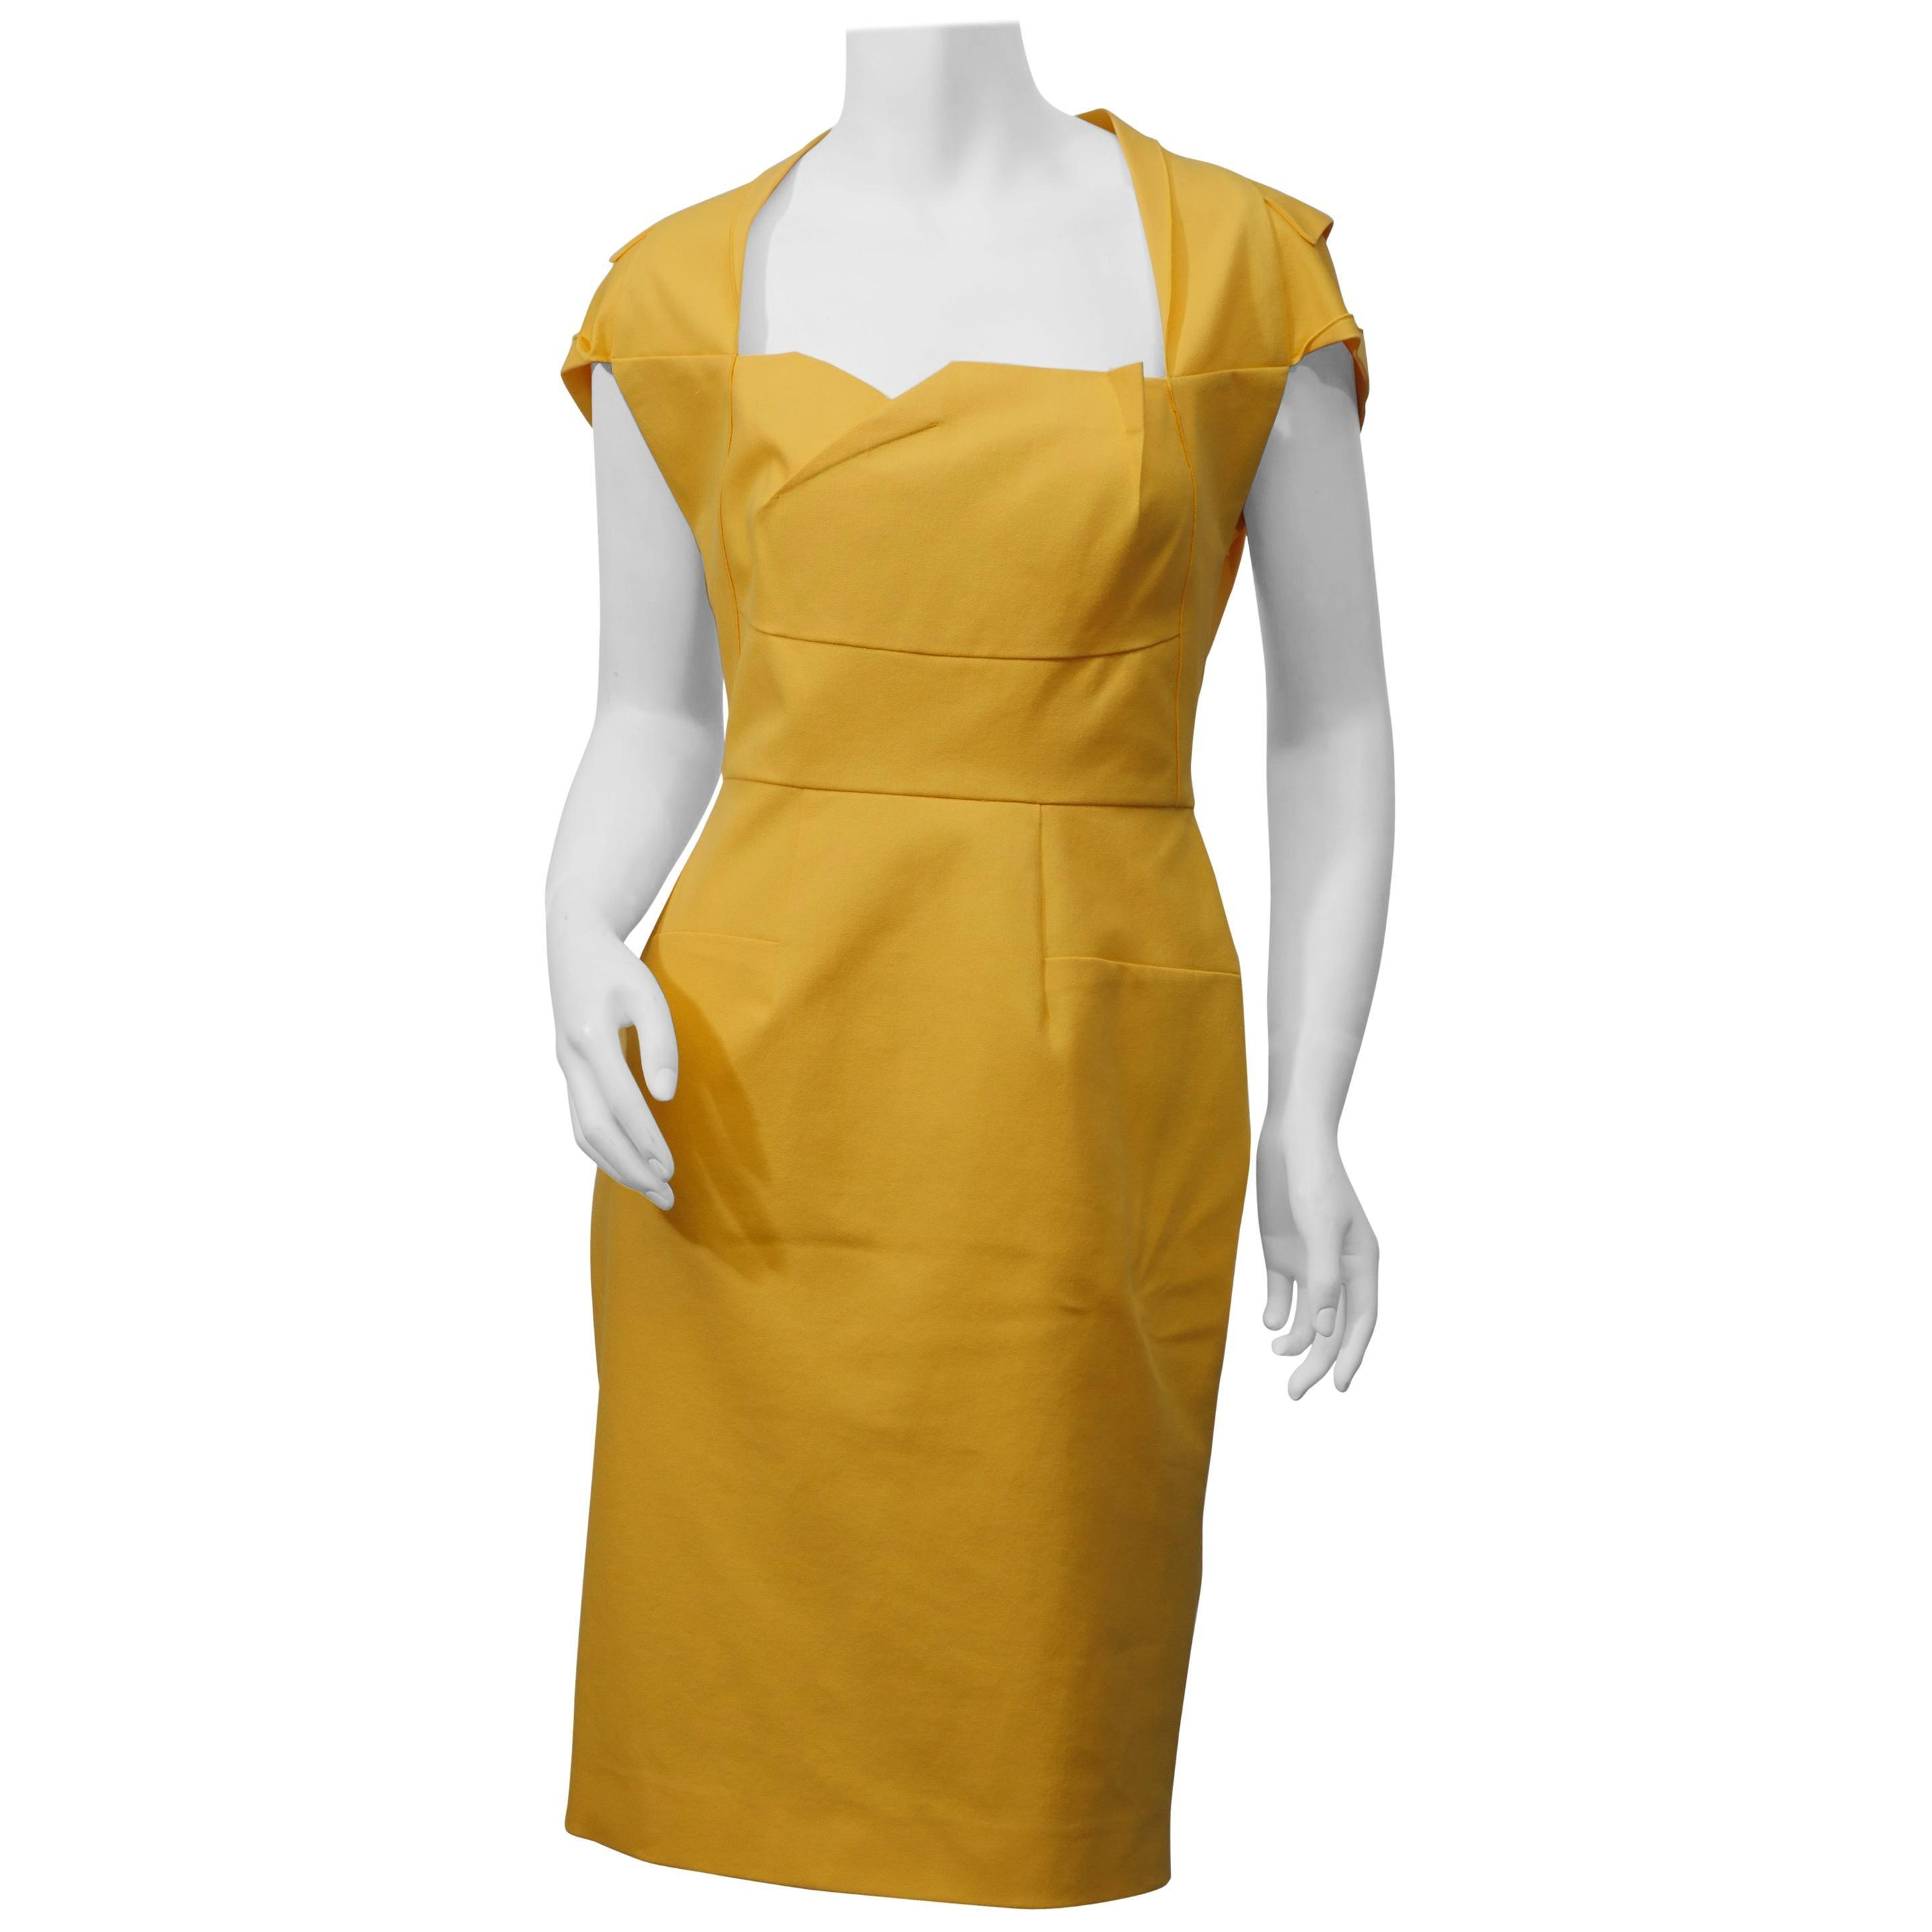 Roland Mouret Size 8 Yellow Cotton 'Limited Edition' Cap Sleeve Sheath Dress